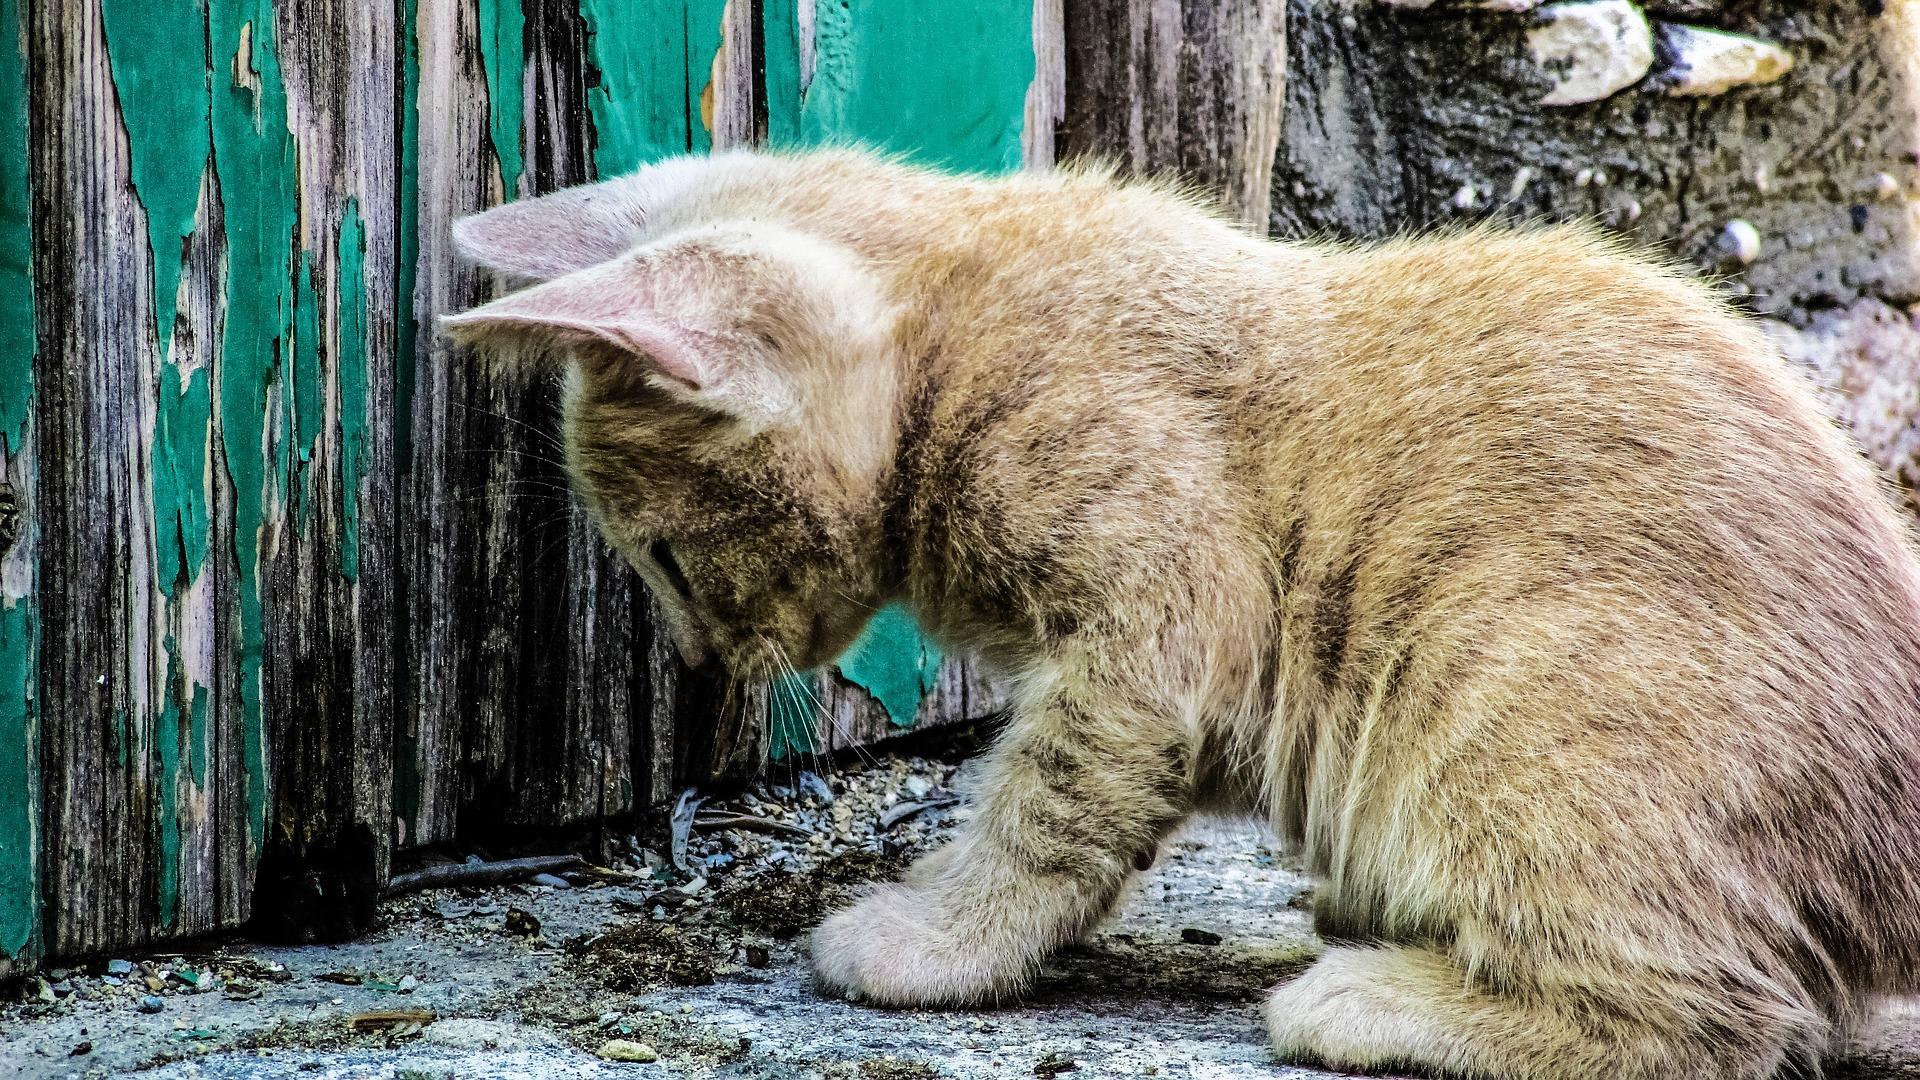 cat-1577135_1920.jpg